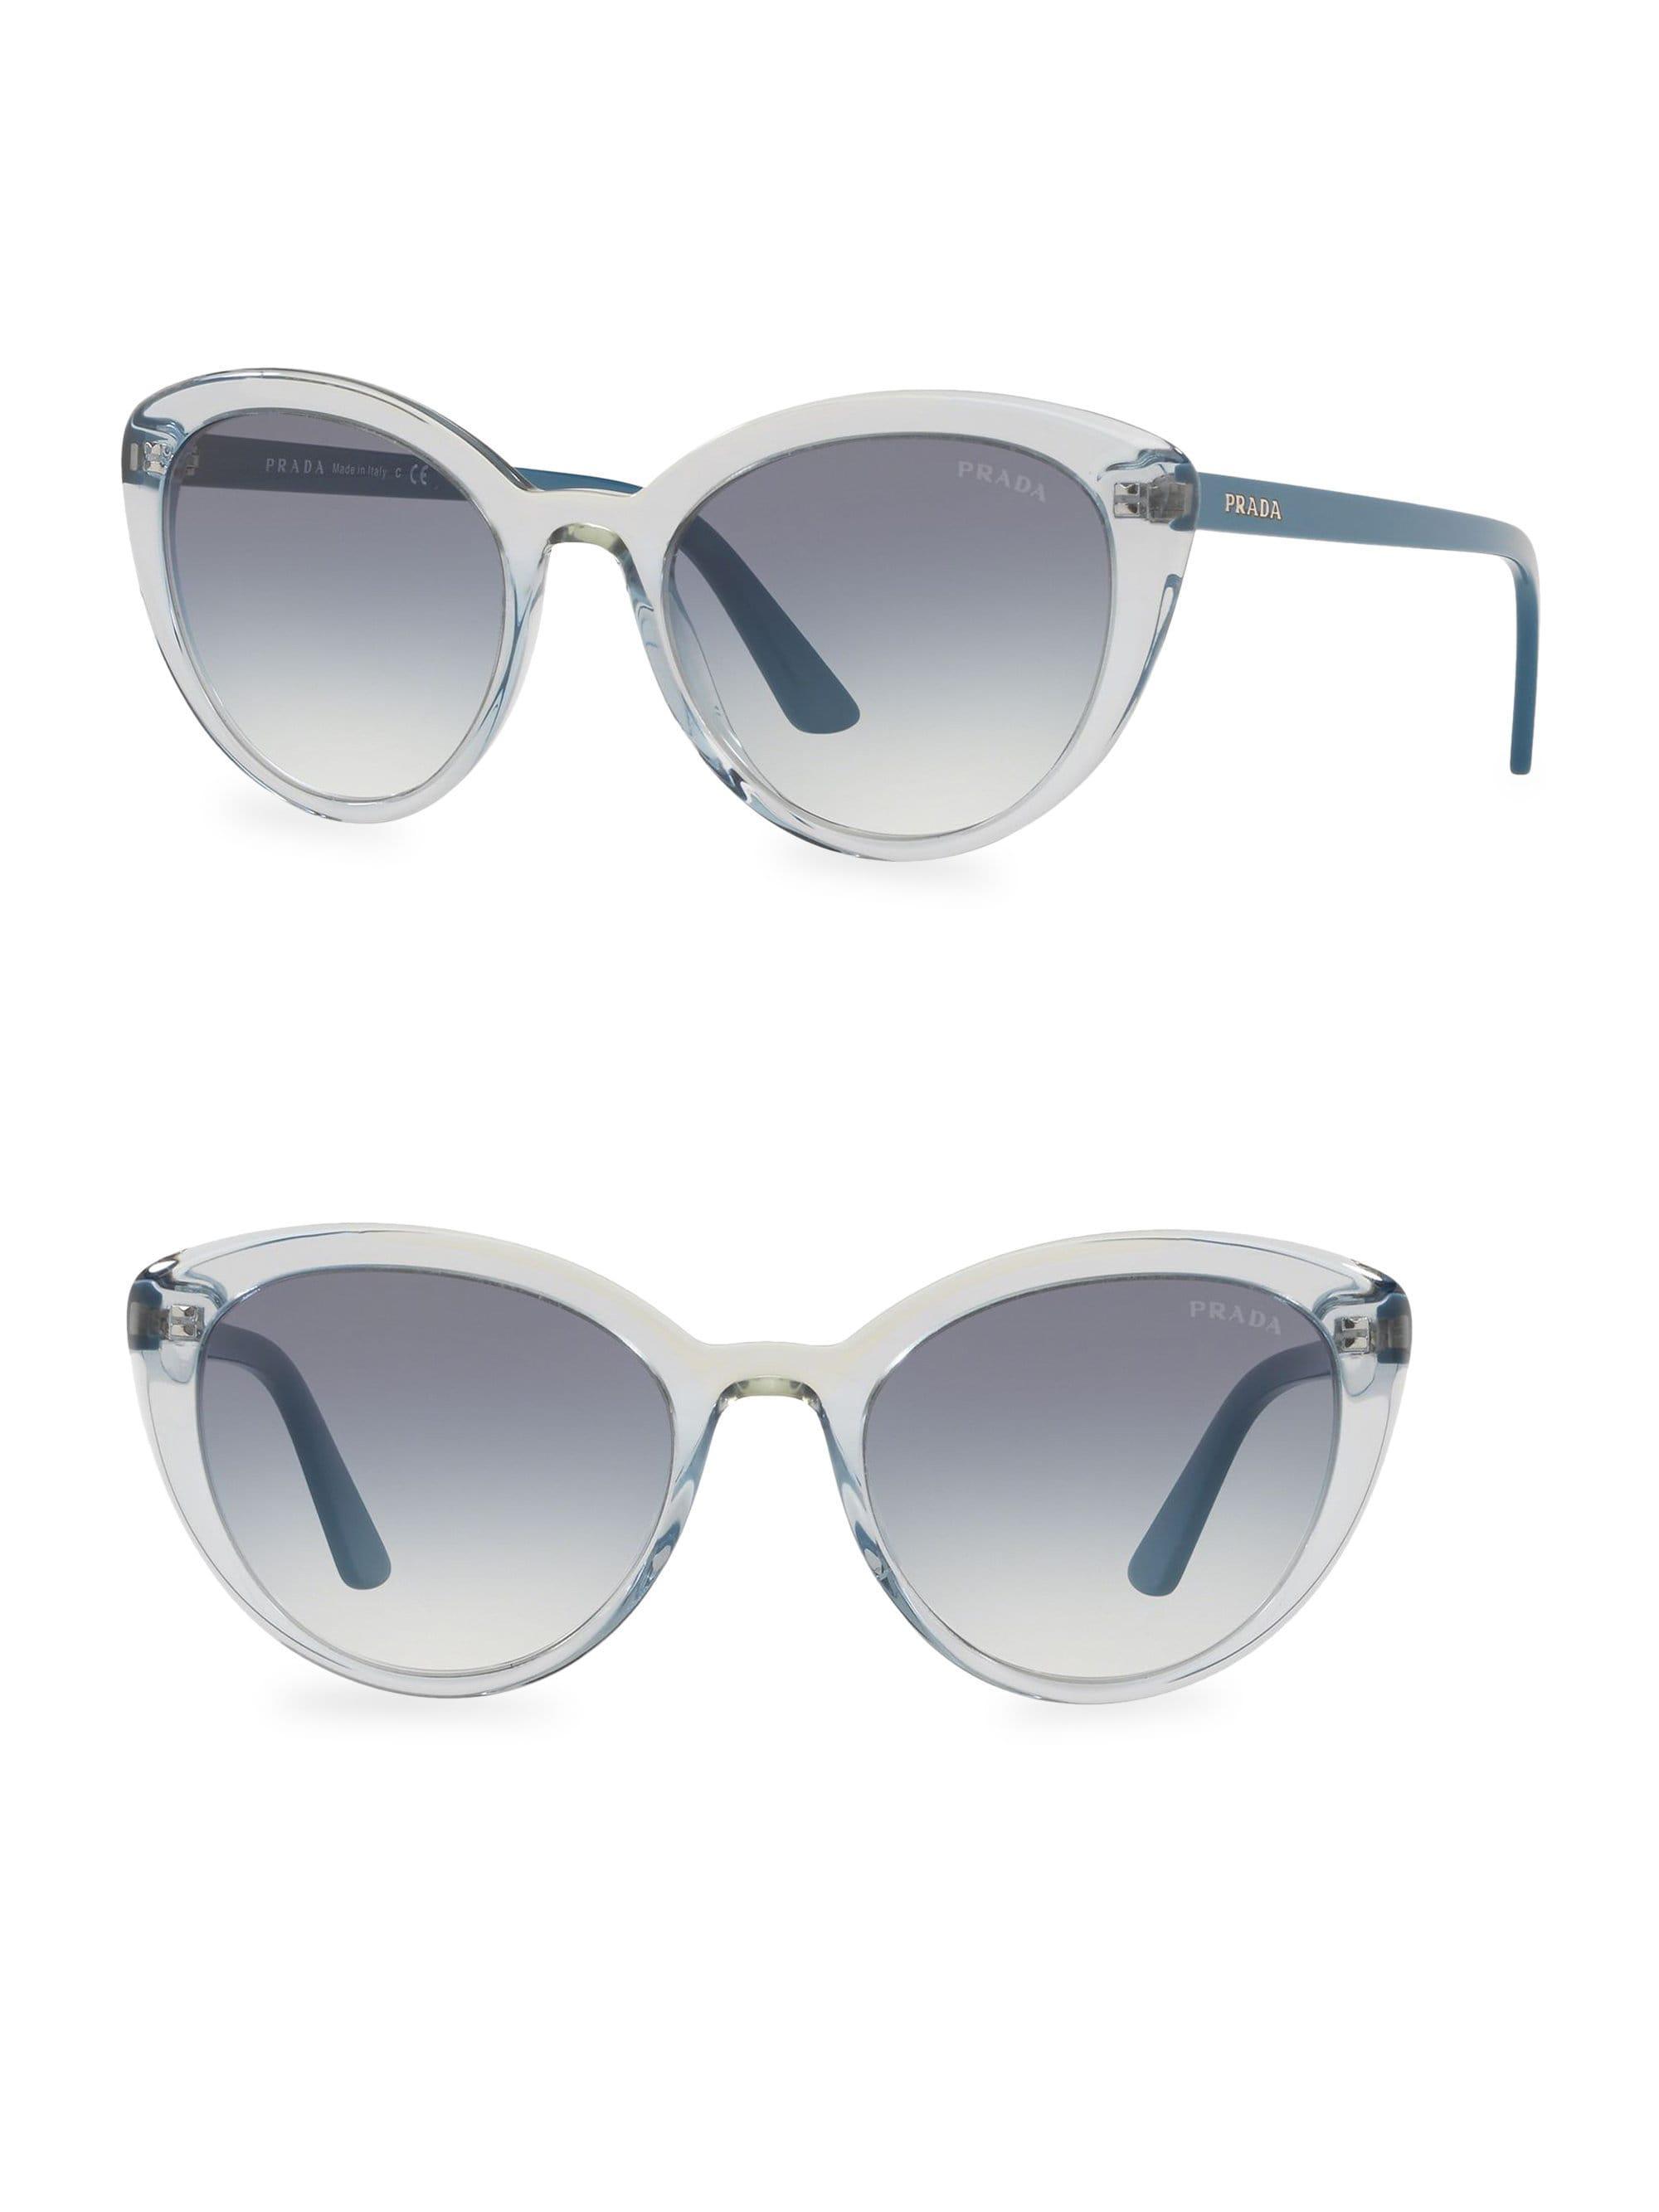 64c873ce24e5 Prada - Gray 54mm Cat Eye Sunglasses - Lyst. View fullscreen